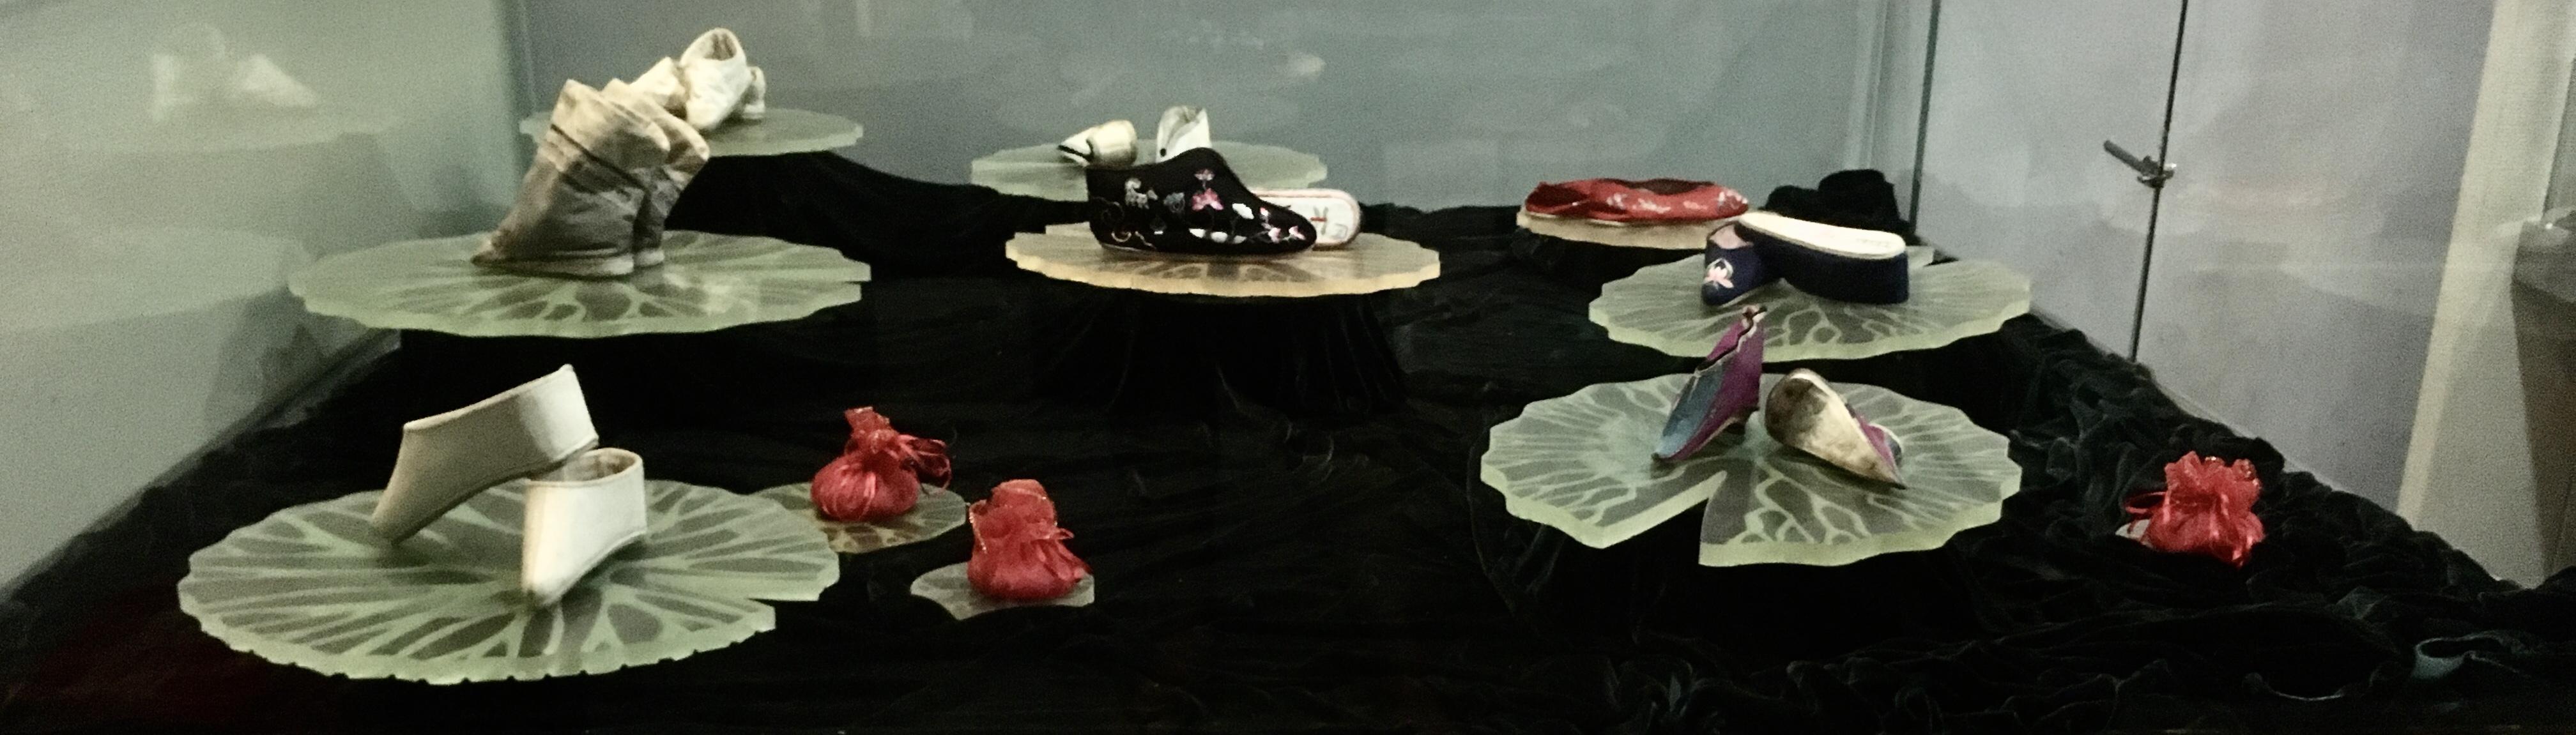 foot binding museum, Wuzhen, foot binding, china, near Shanghai, culture, image by Jade Jackson